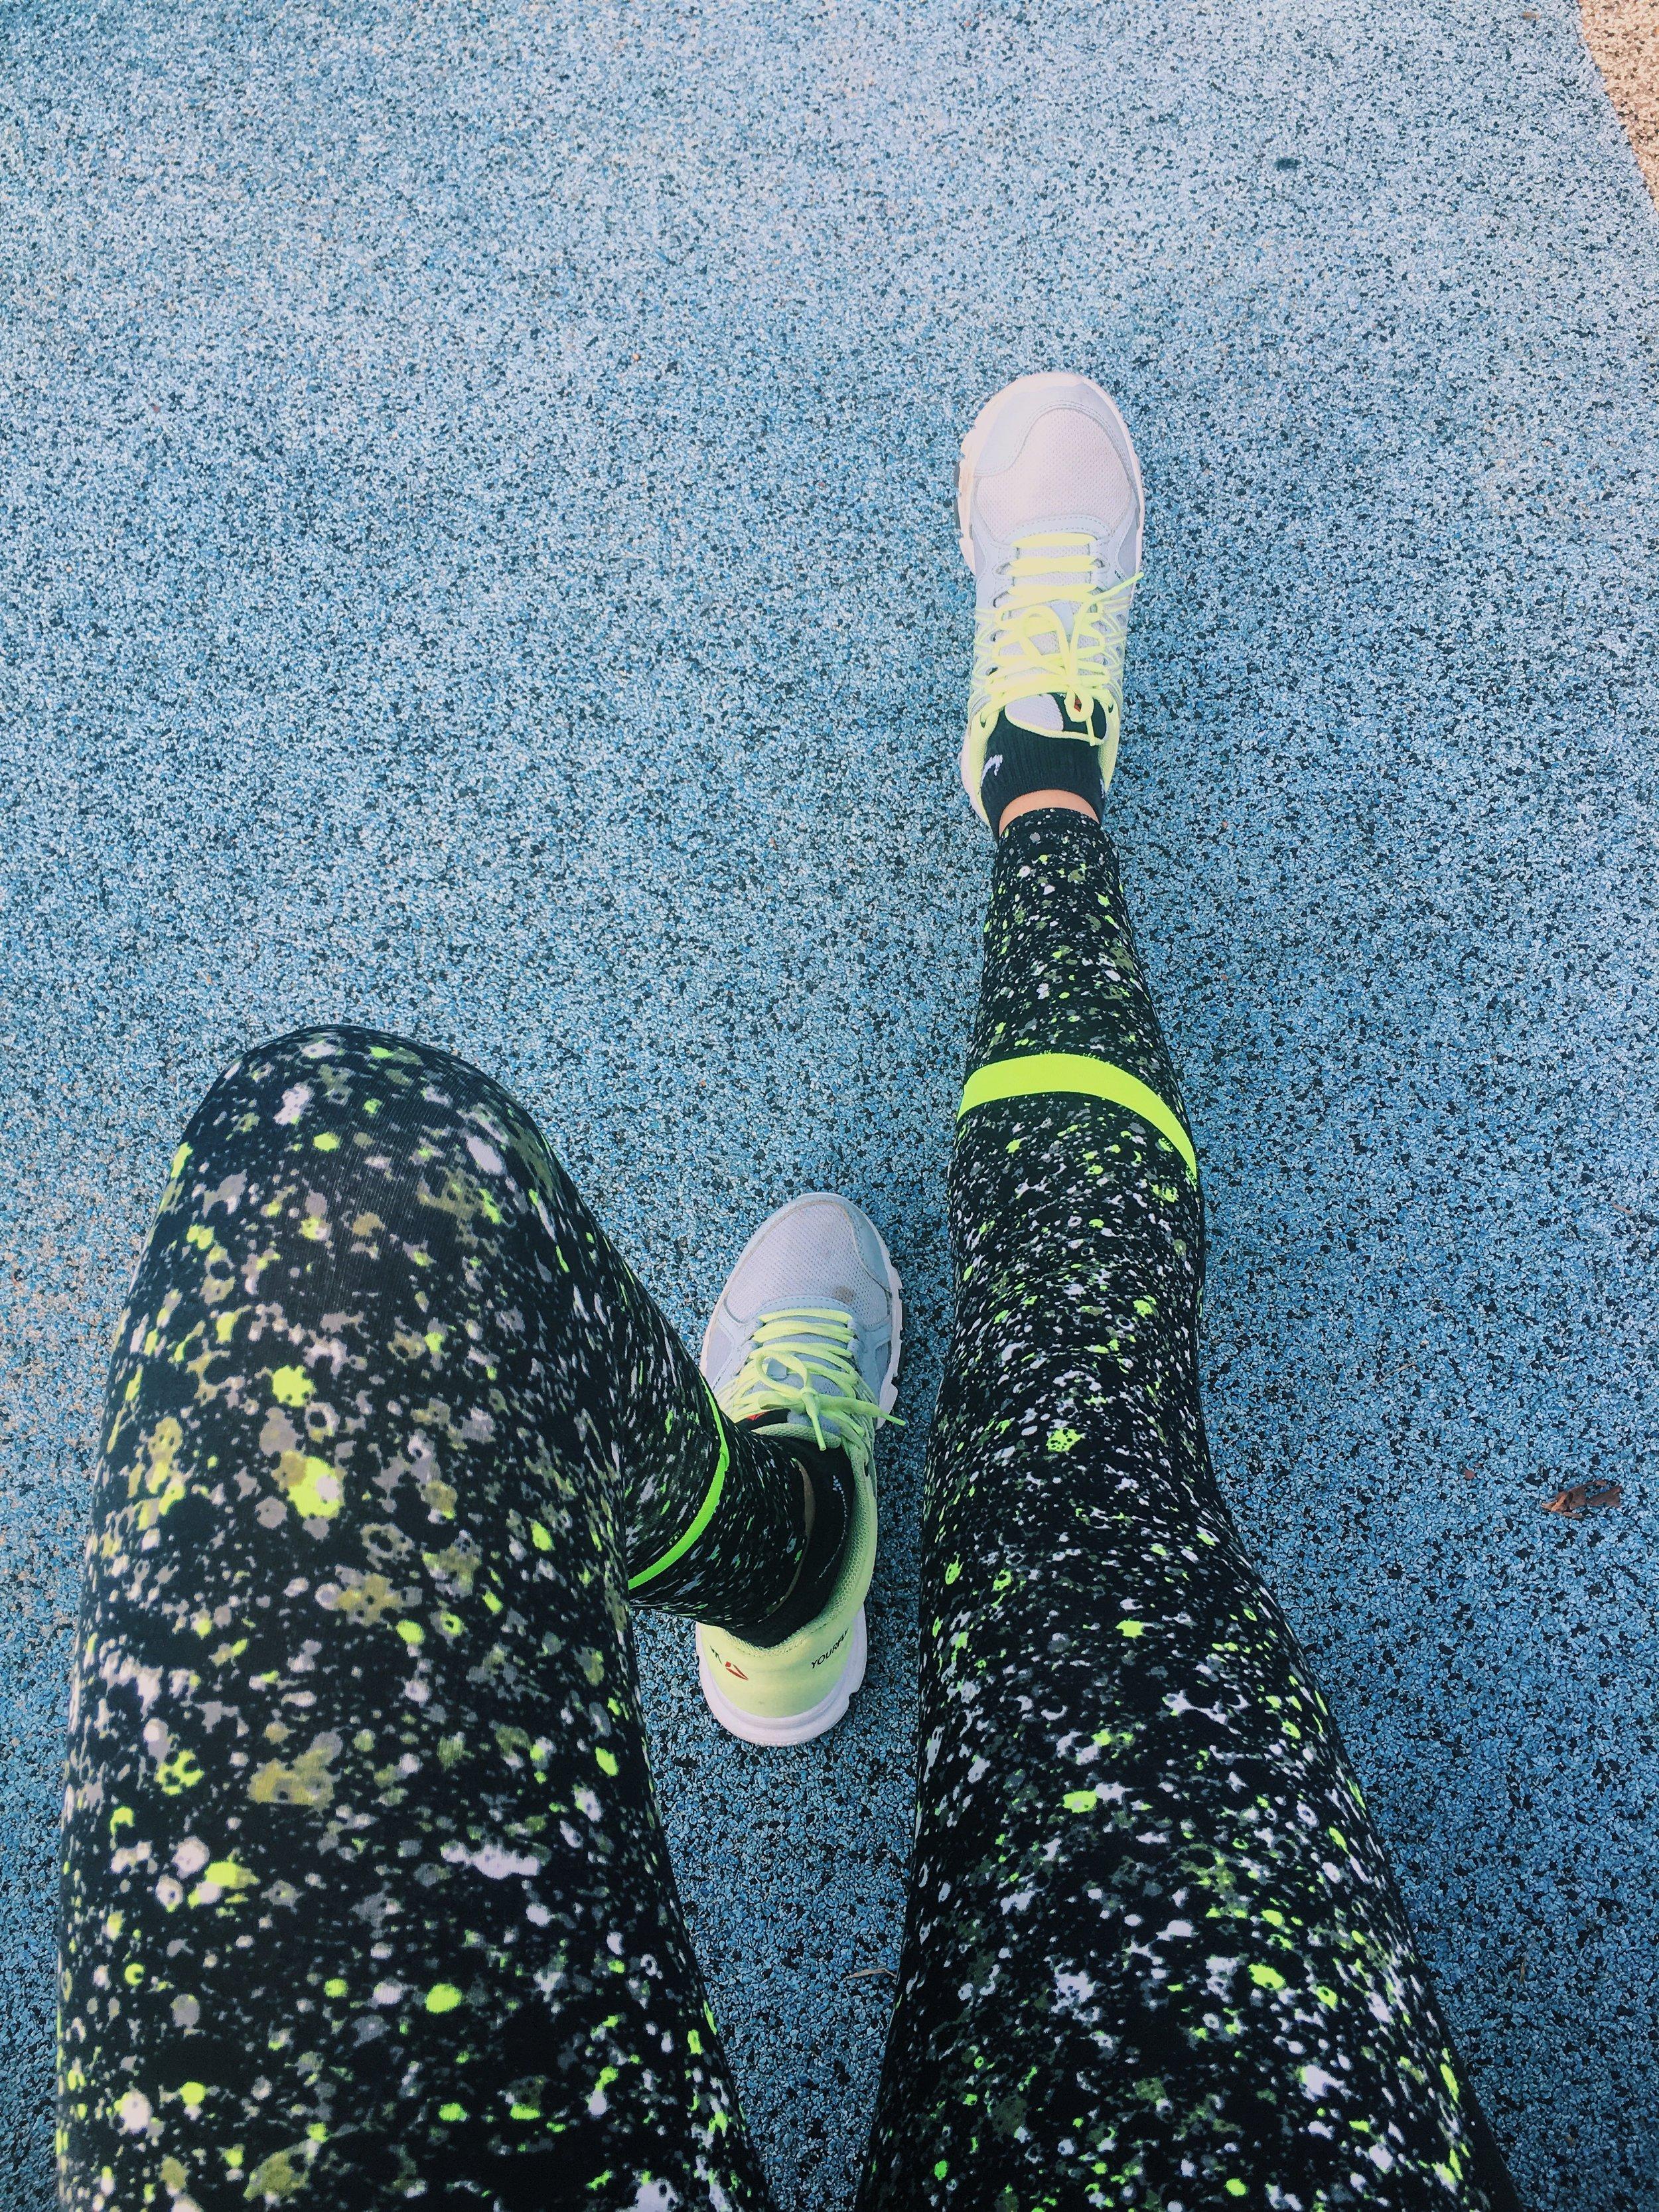 cardio-LISS-workout-ideas